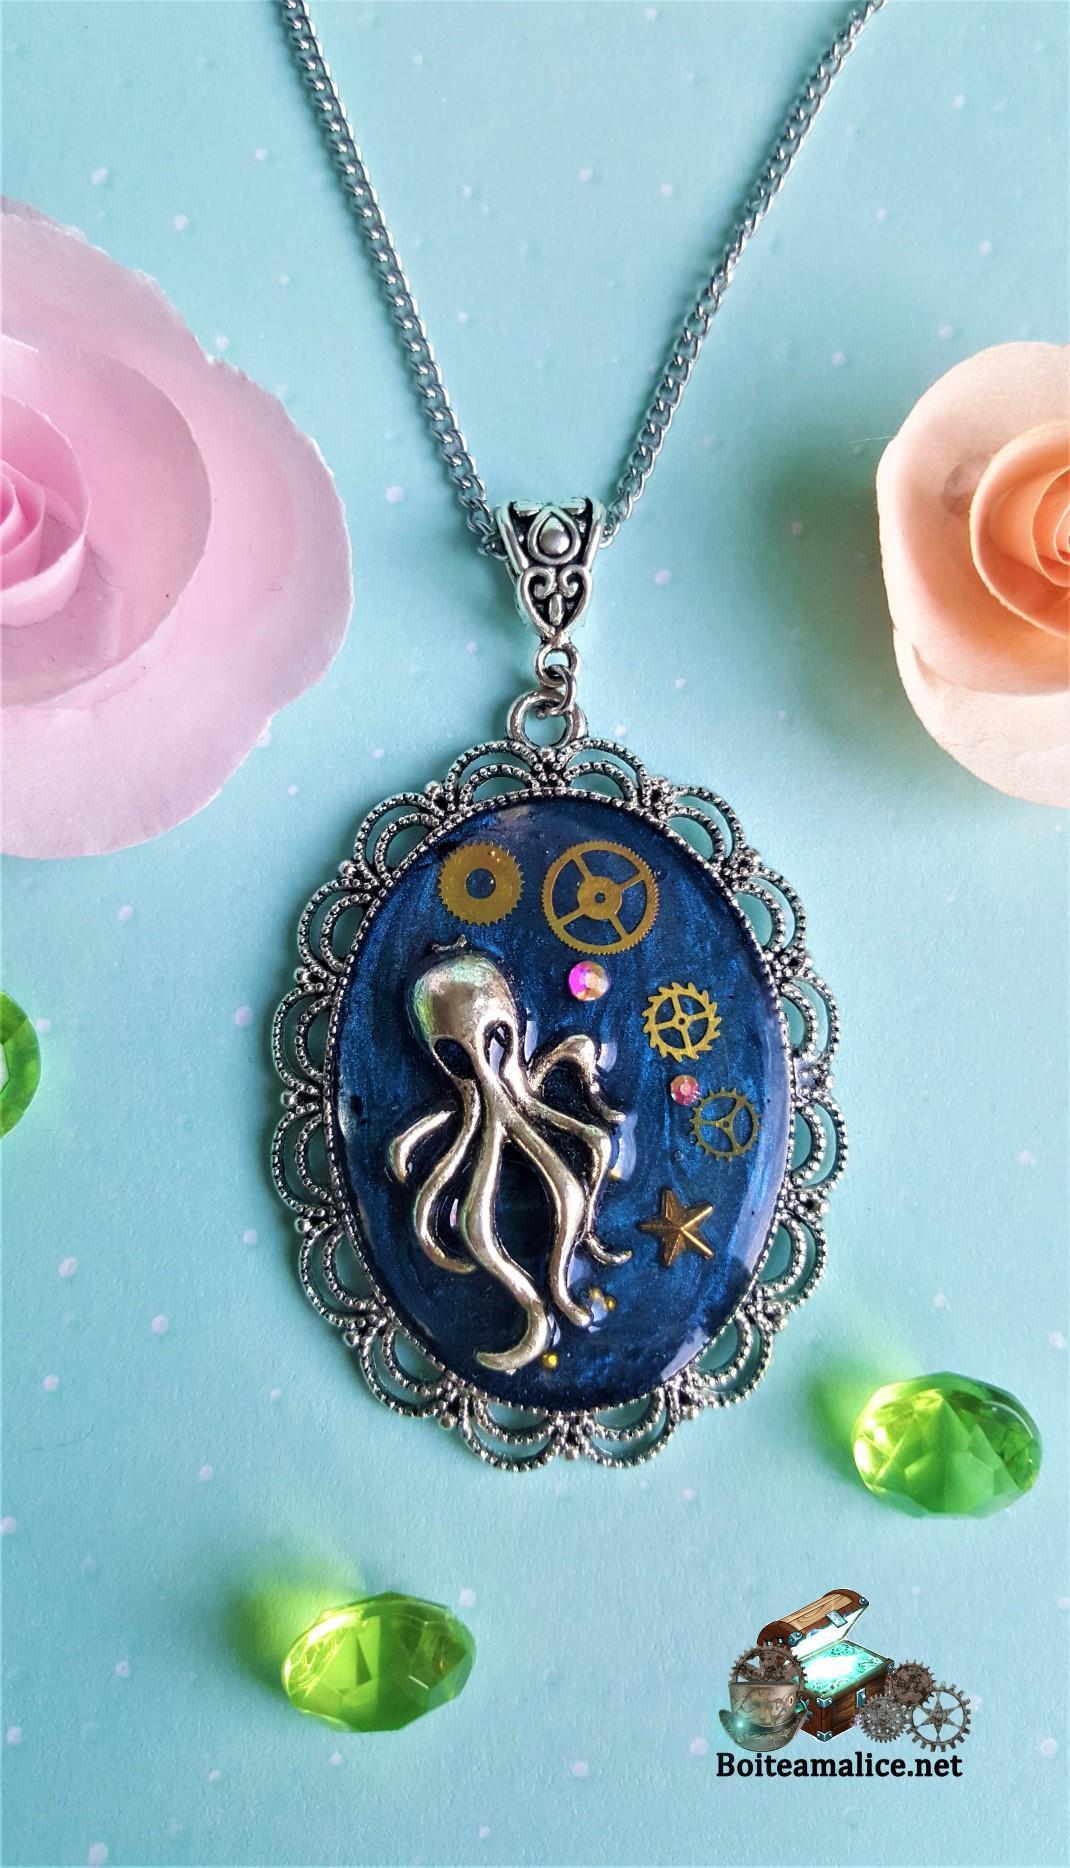 Pendentif octopus steampunk bijou femme